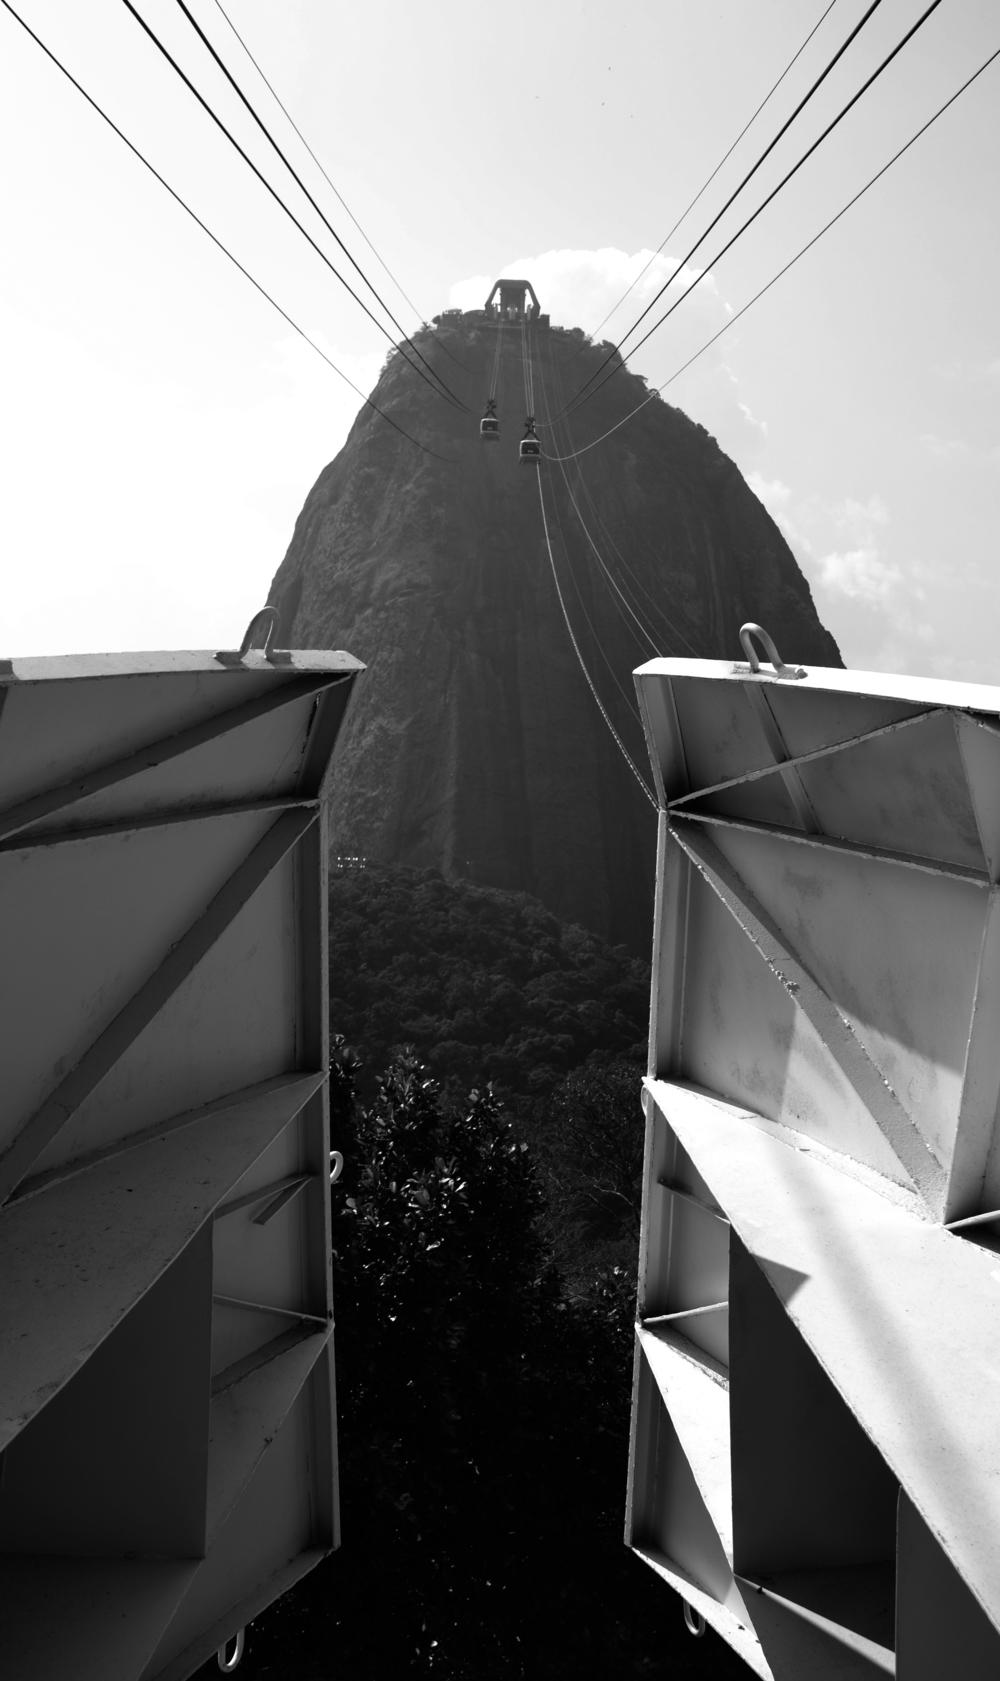 Sugarloaf at Copacabana